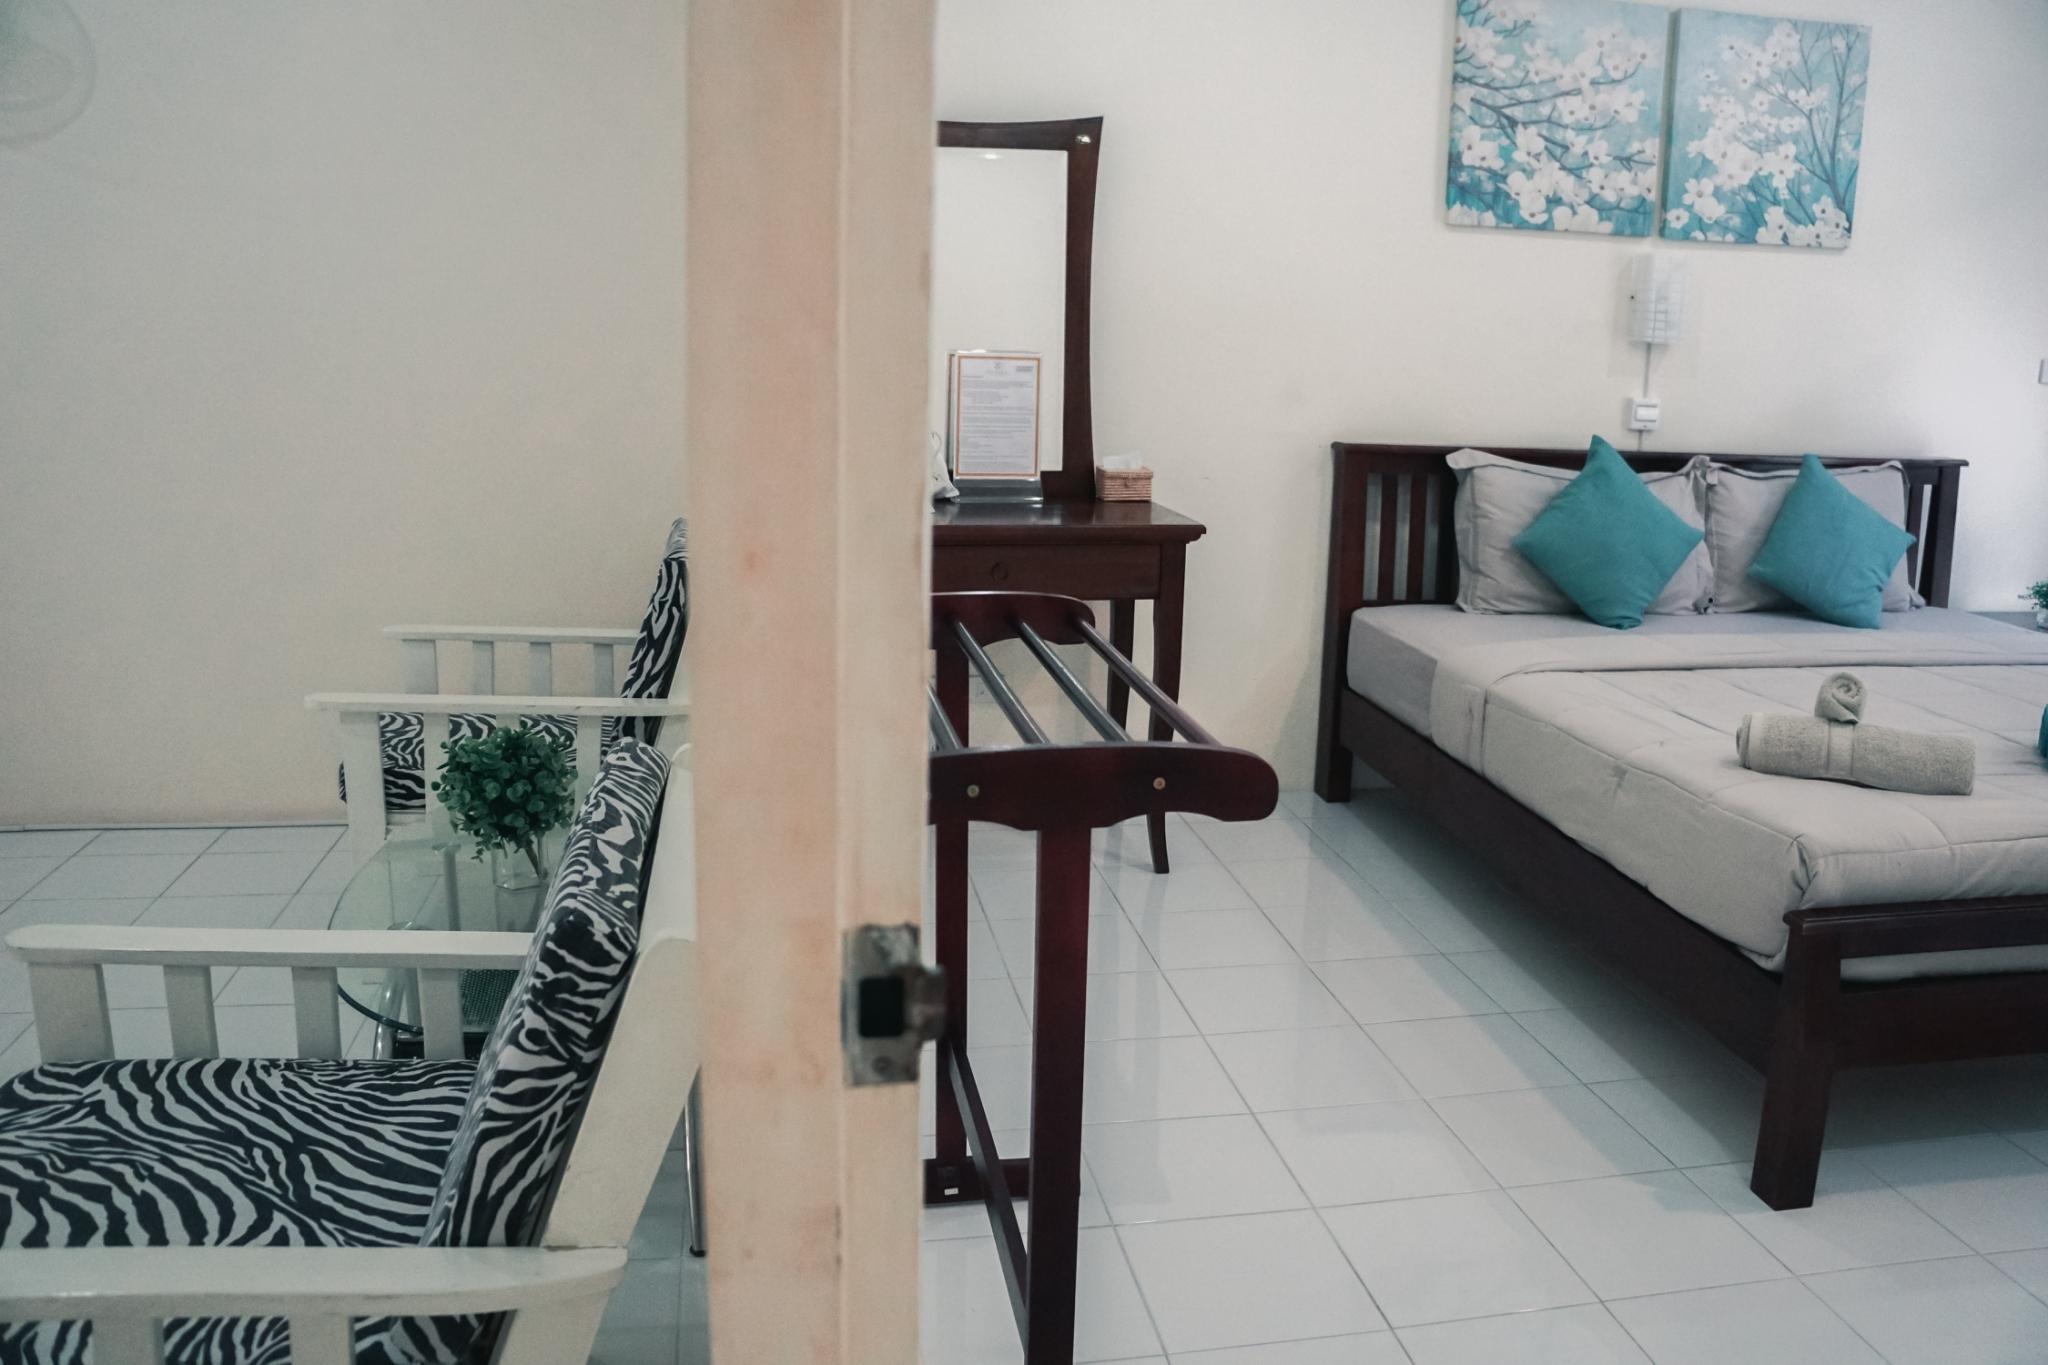 #2 Deluxe King Apartment, FullBreakfast อพาร์ตเมนต์ 1 ห้องนอน 1 ห้องน้ำส่วนตัว ขนาด 50 ตร.ม. – หาดคลองดาว/หาดพระแอ